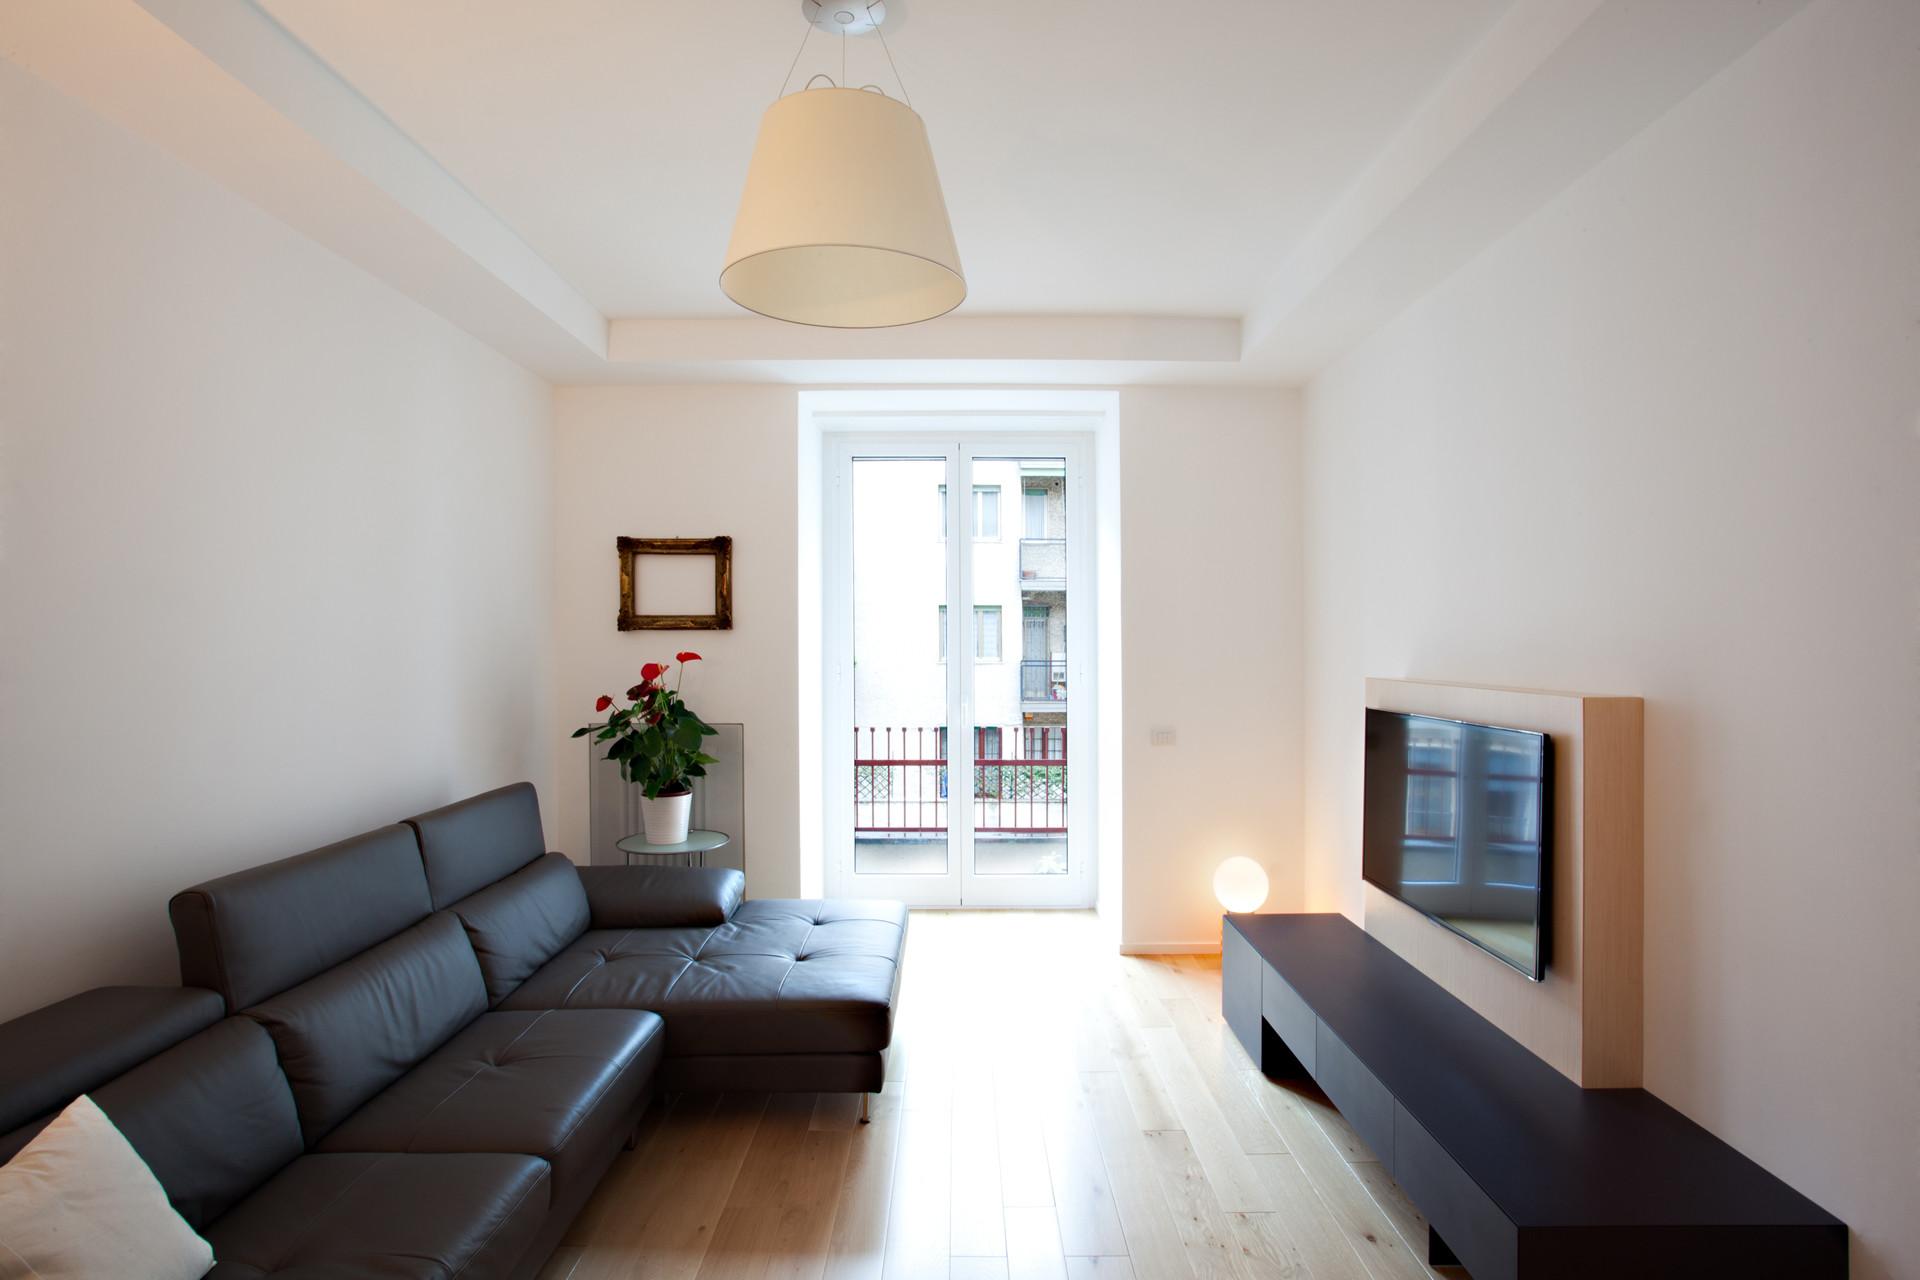 Wisp-Architects- Oxilia Apartment 7